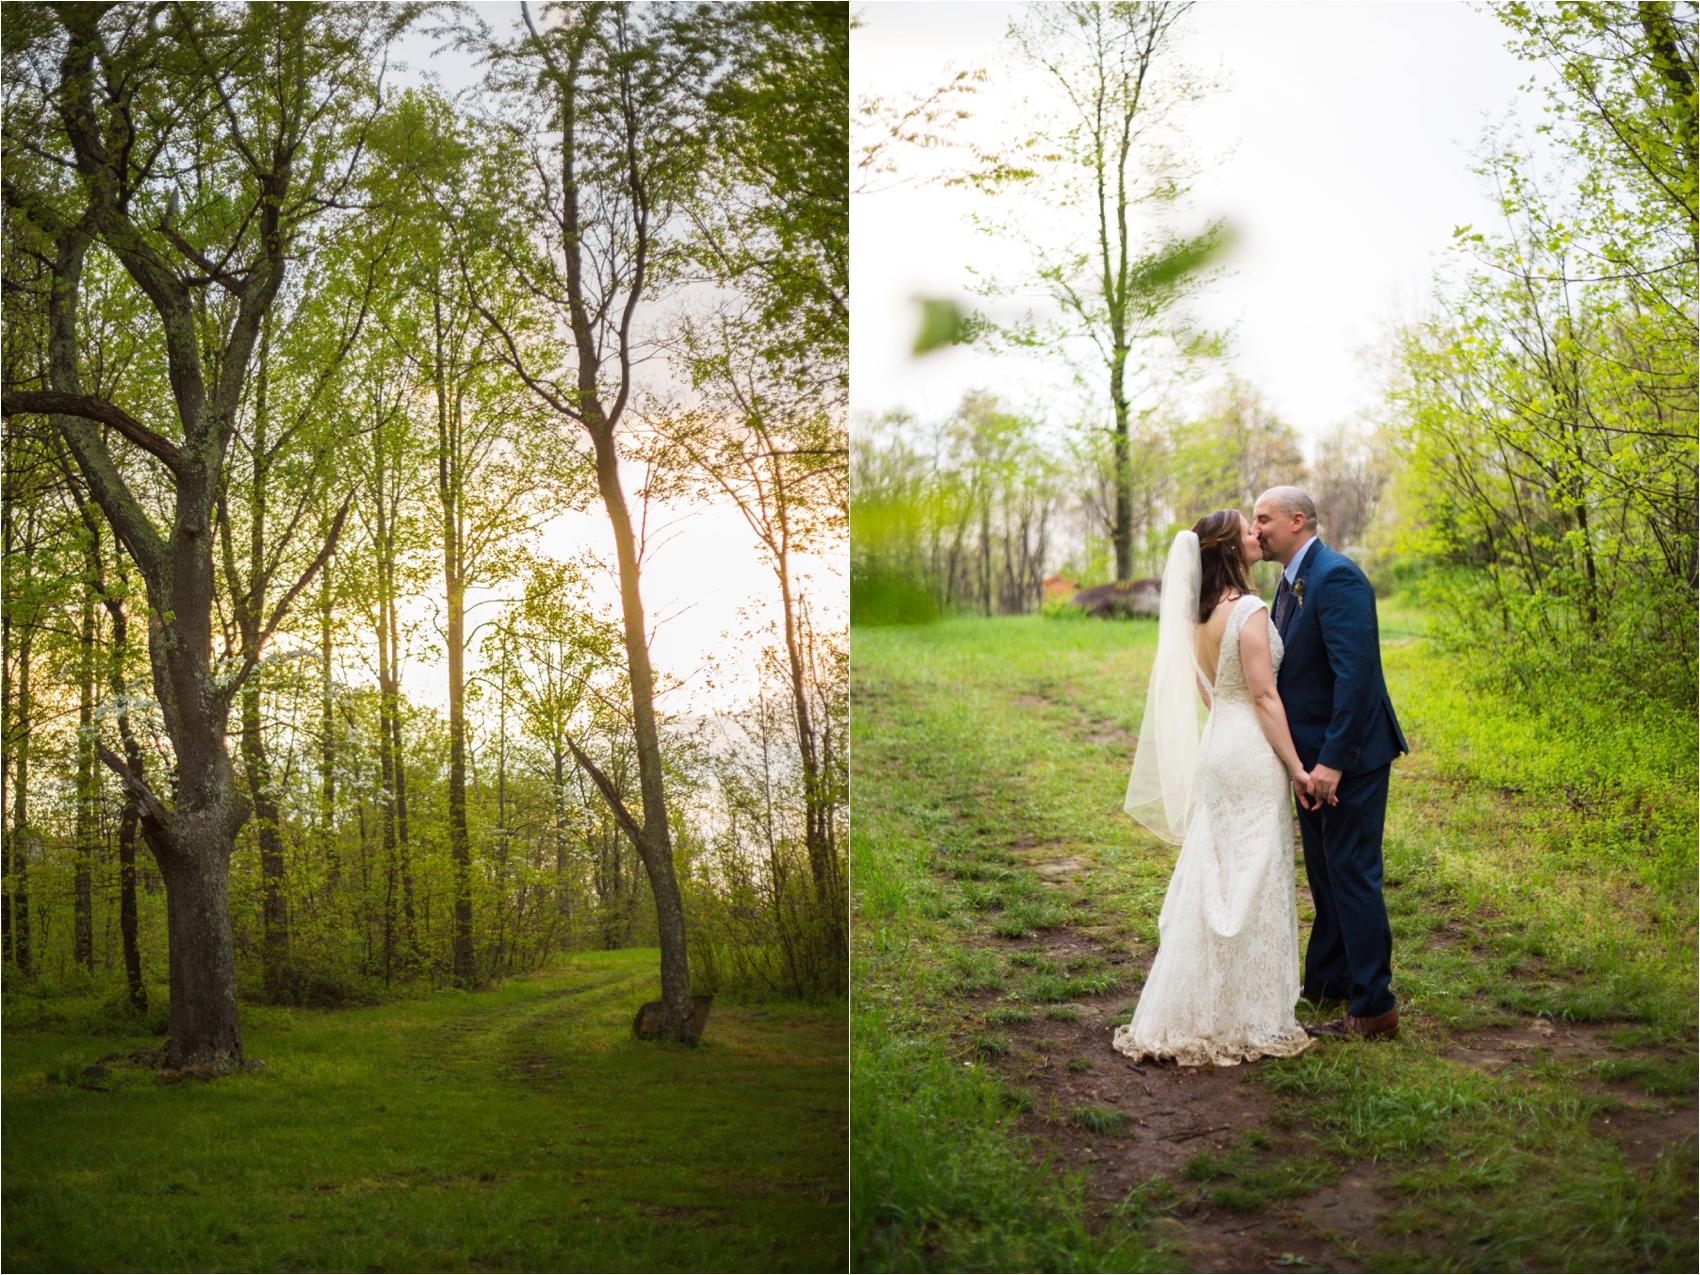 Lydia-Mountain-Spring-Virginia-Wedding-1172.jpg